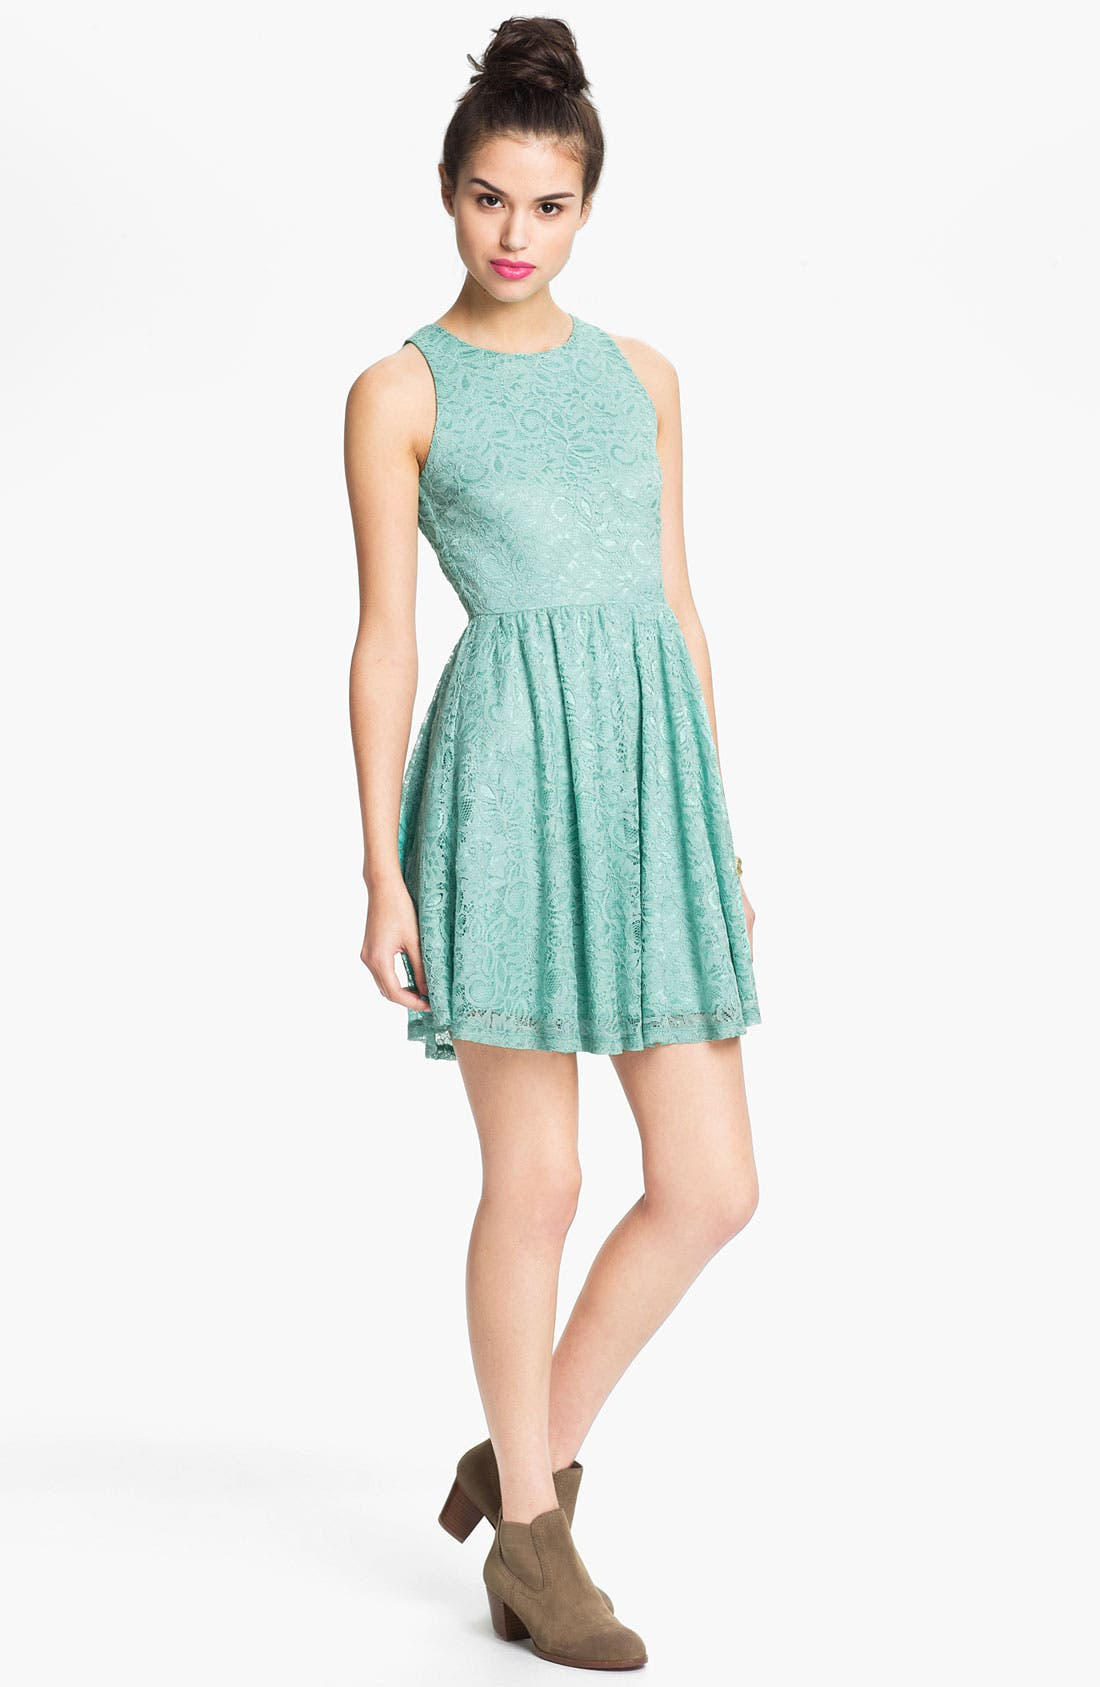 Alternate Image 1 Selected - Soprano Lace Skater Dress (Juniors)